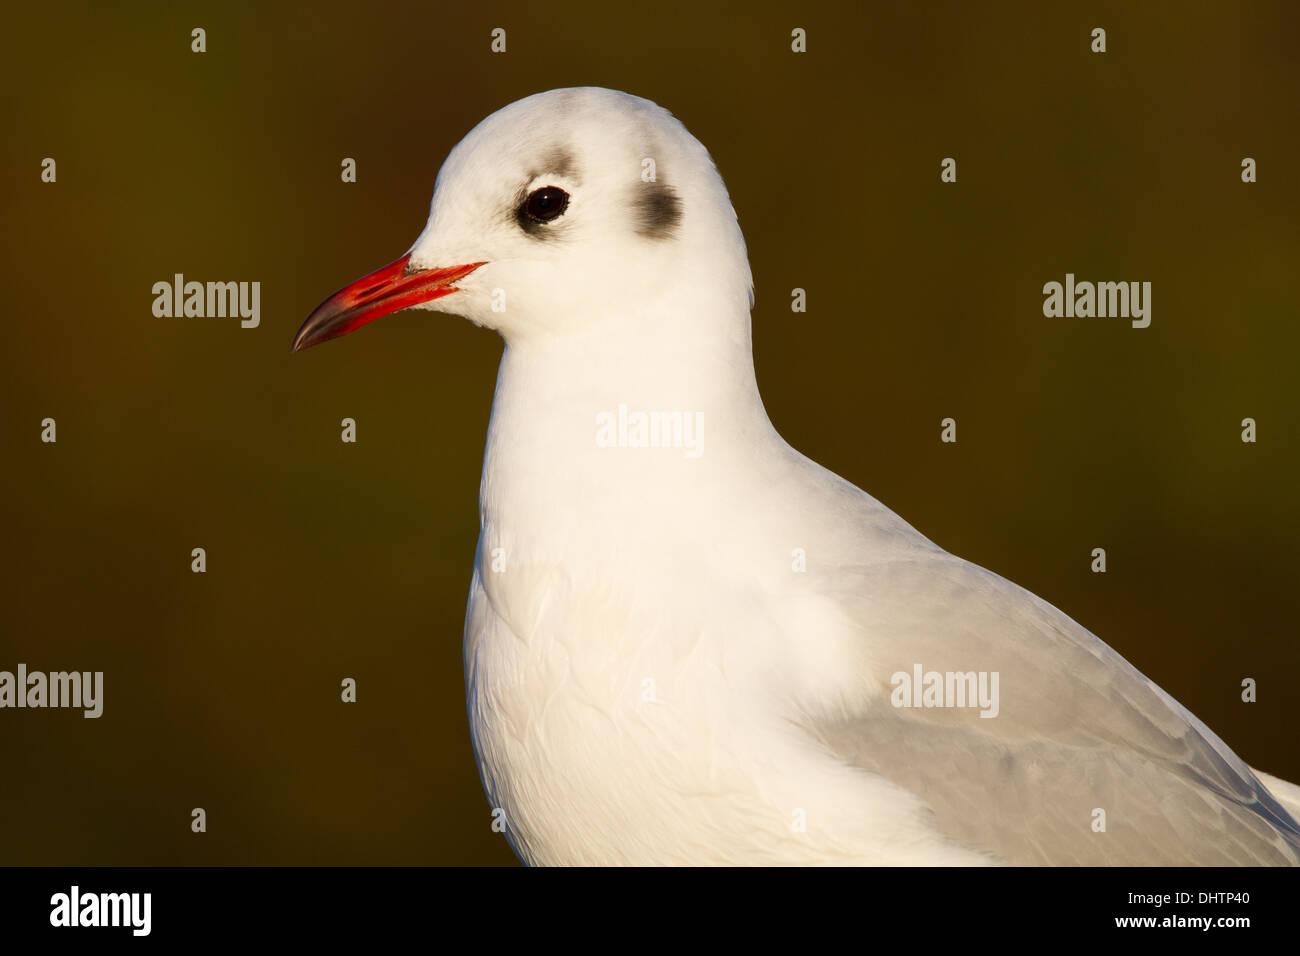 Adult-winter Black-headed Gull (Larus ridibundus) Stock Photo